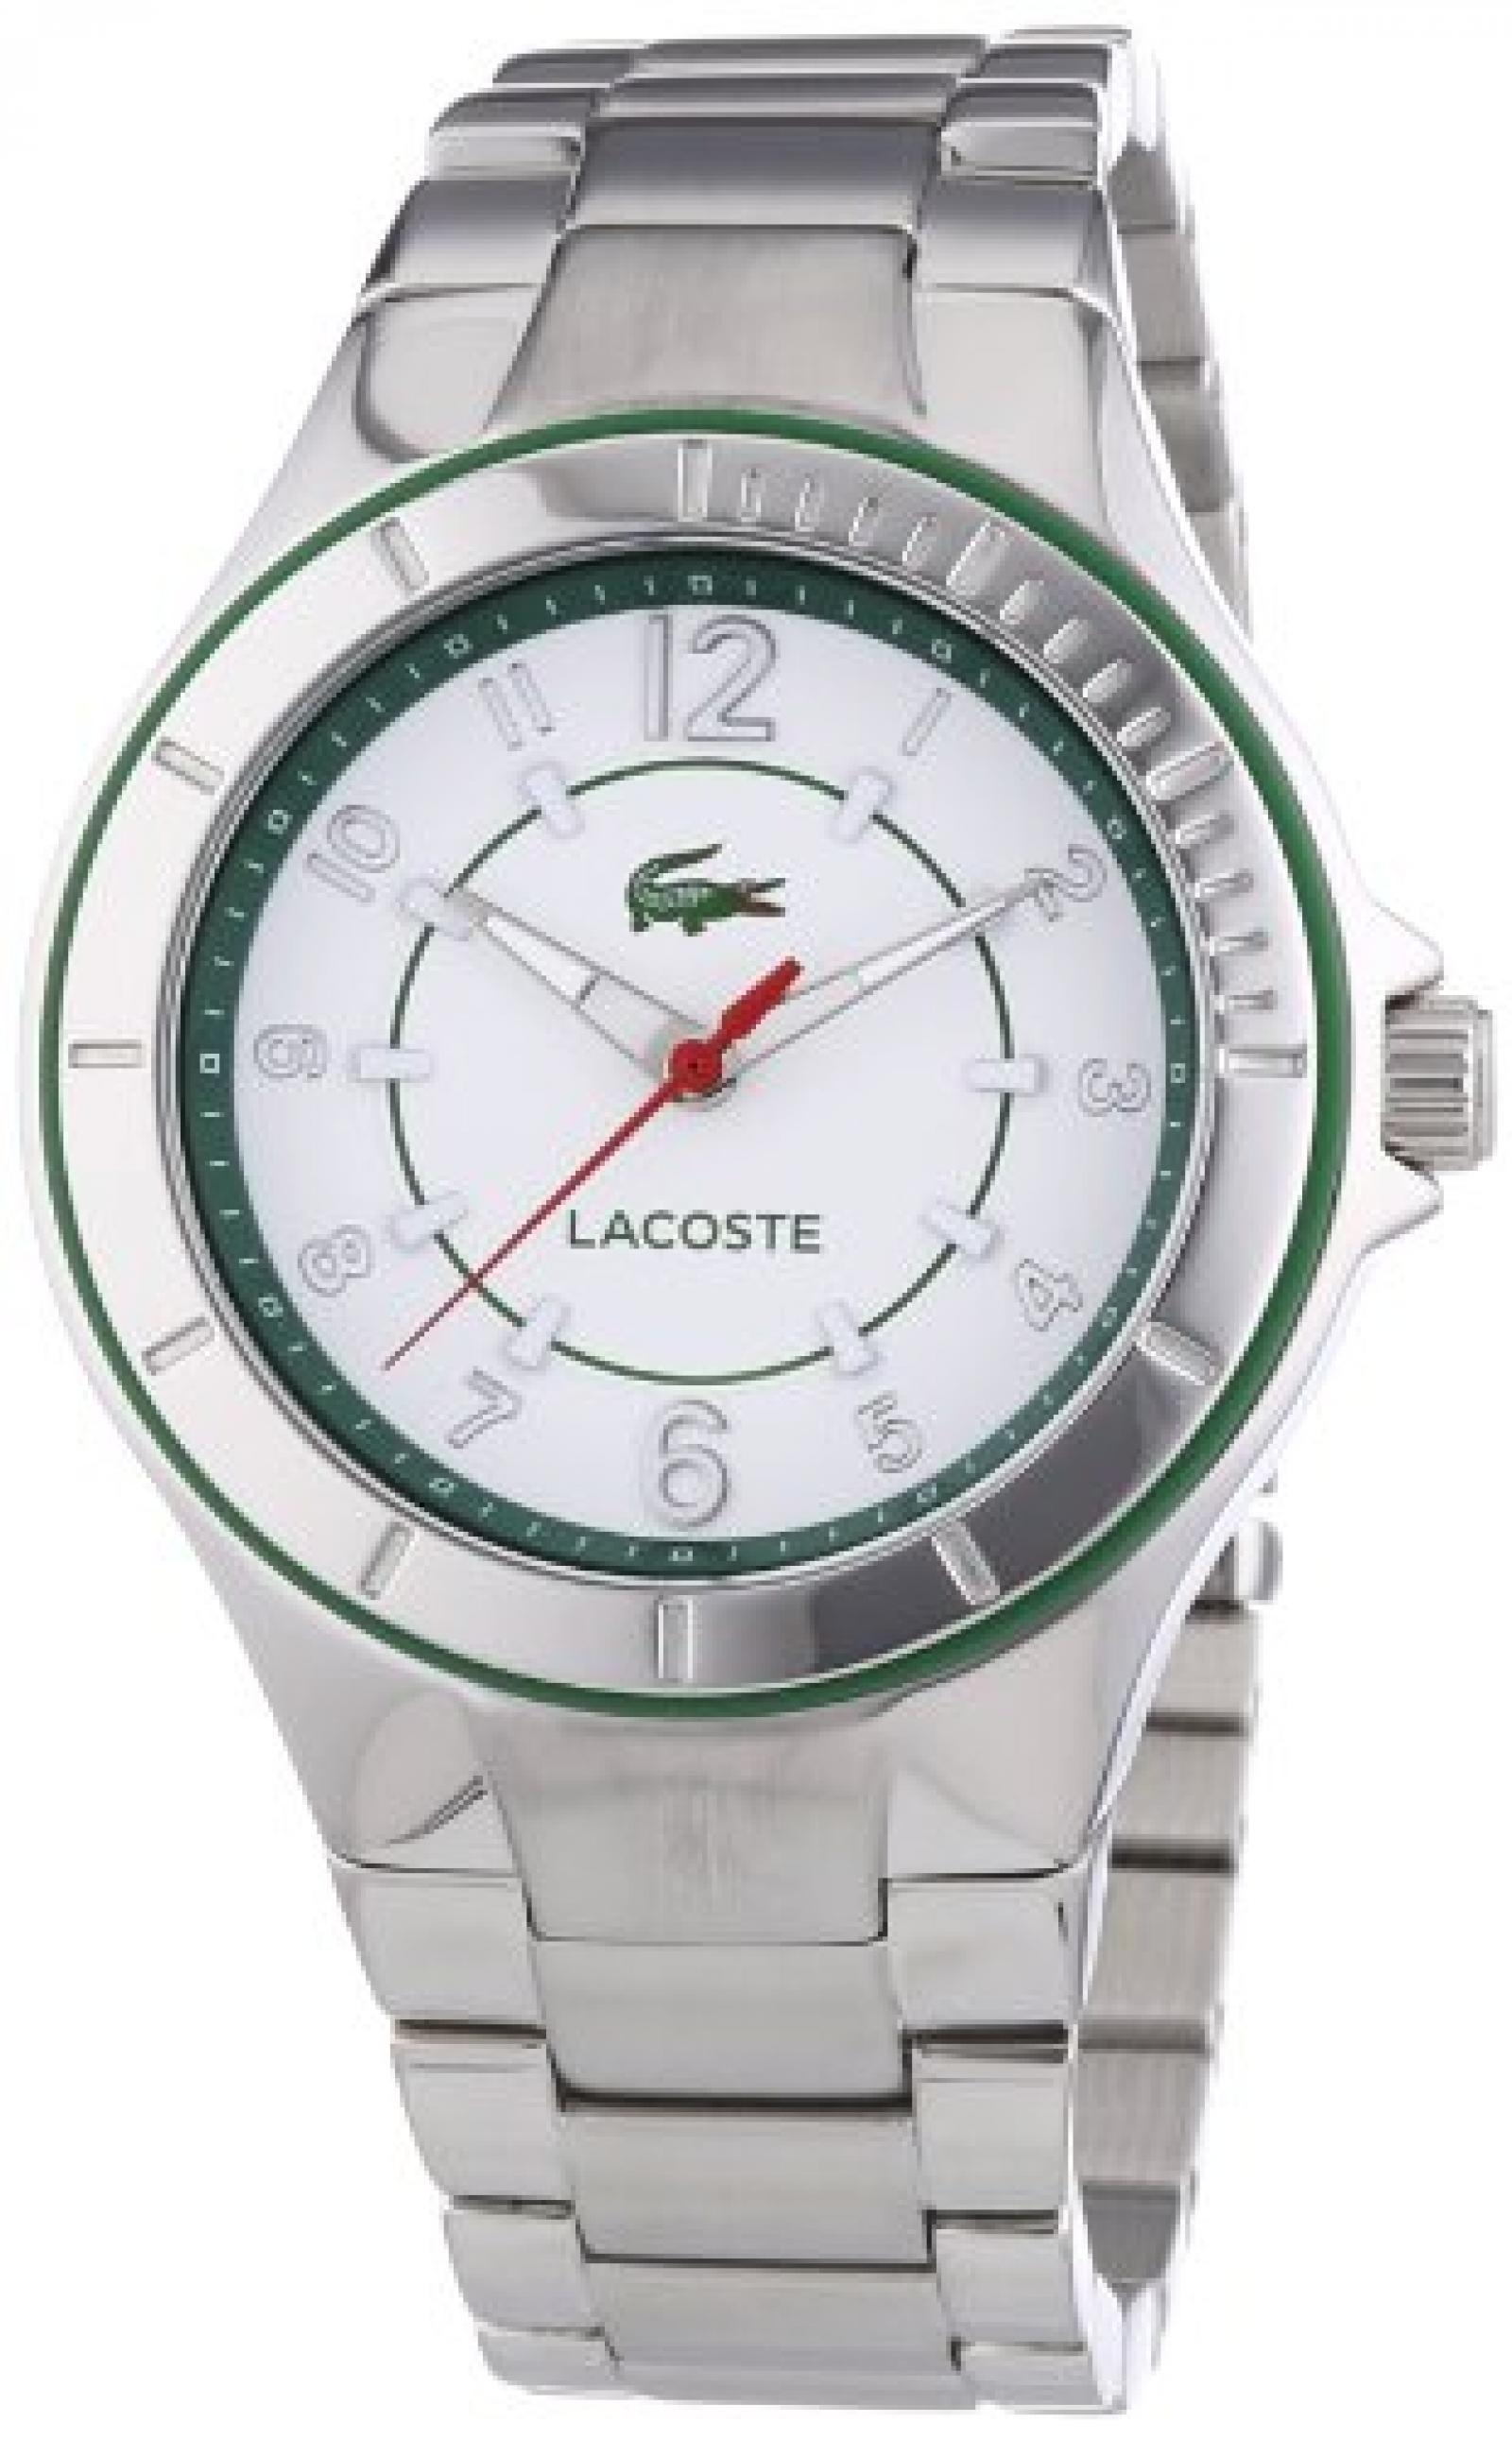 Lacoste Damen-Armbanduhr Acapulco Analog Quarz Edelstahl 2000814